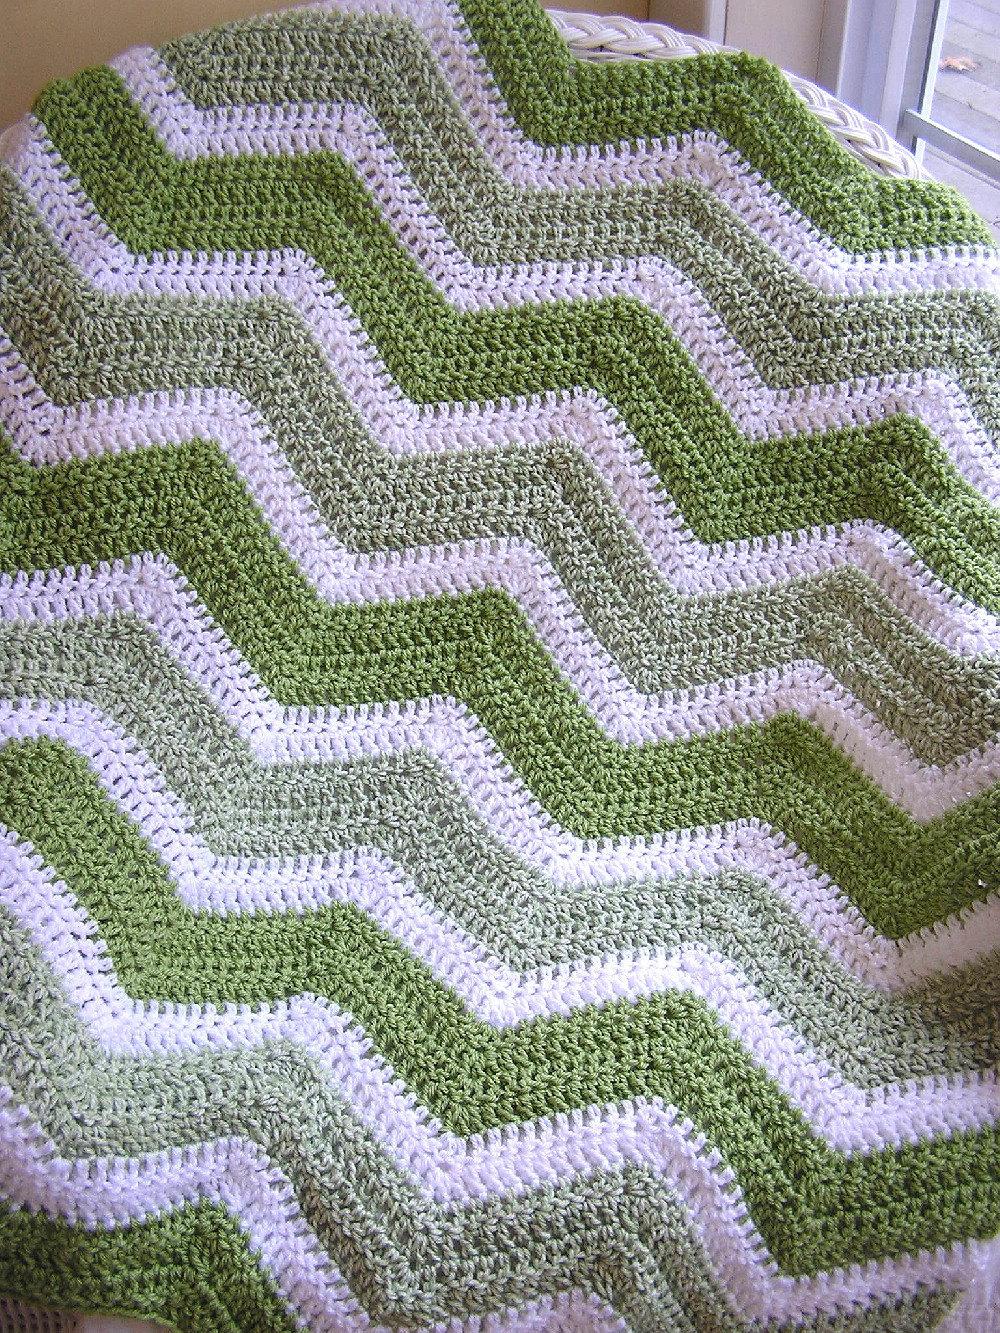 Crochet Zig Zag Baby Blanket : chevron zig zag baby blanket afghan wrap crochet knit toddler lap ...